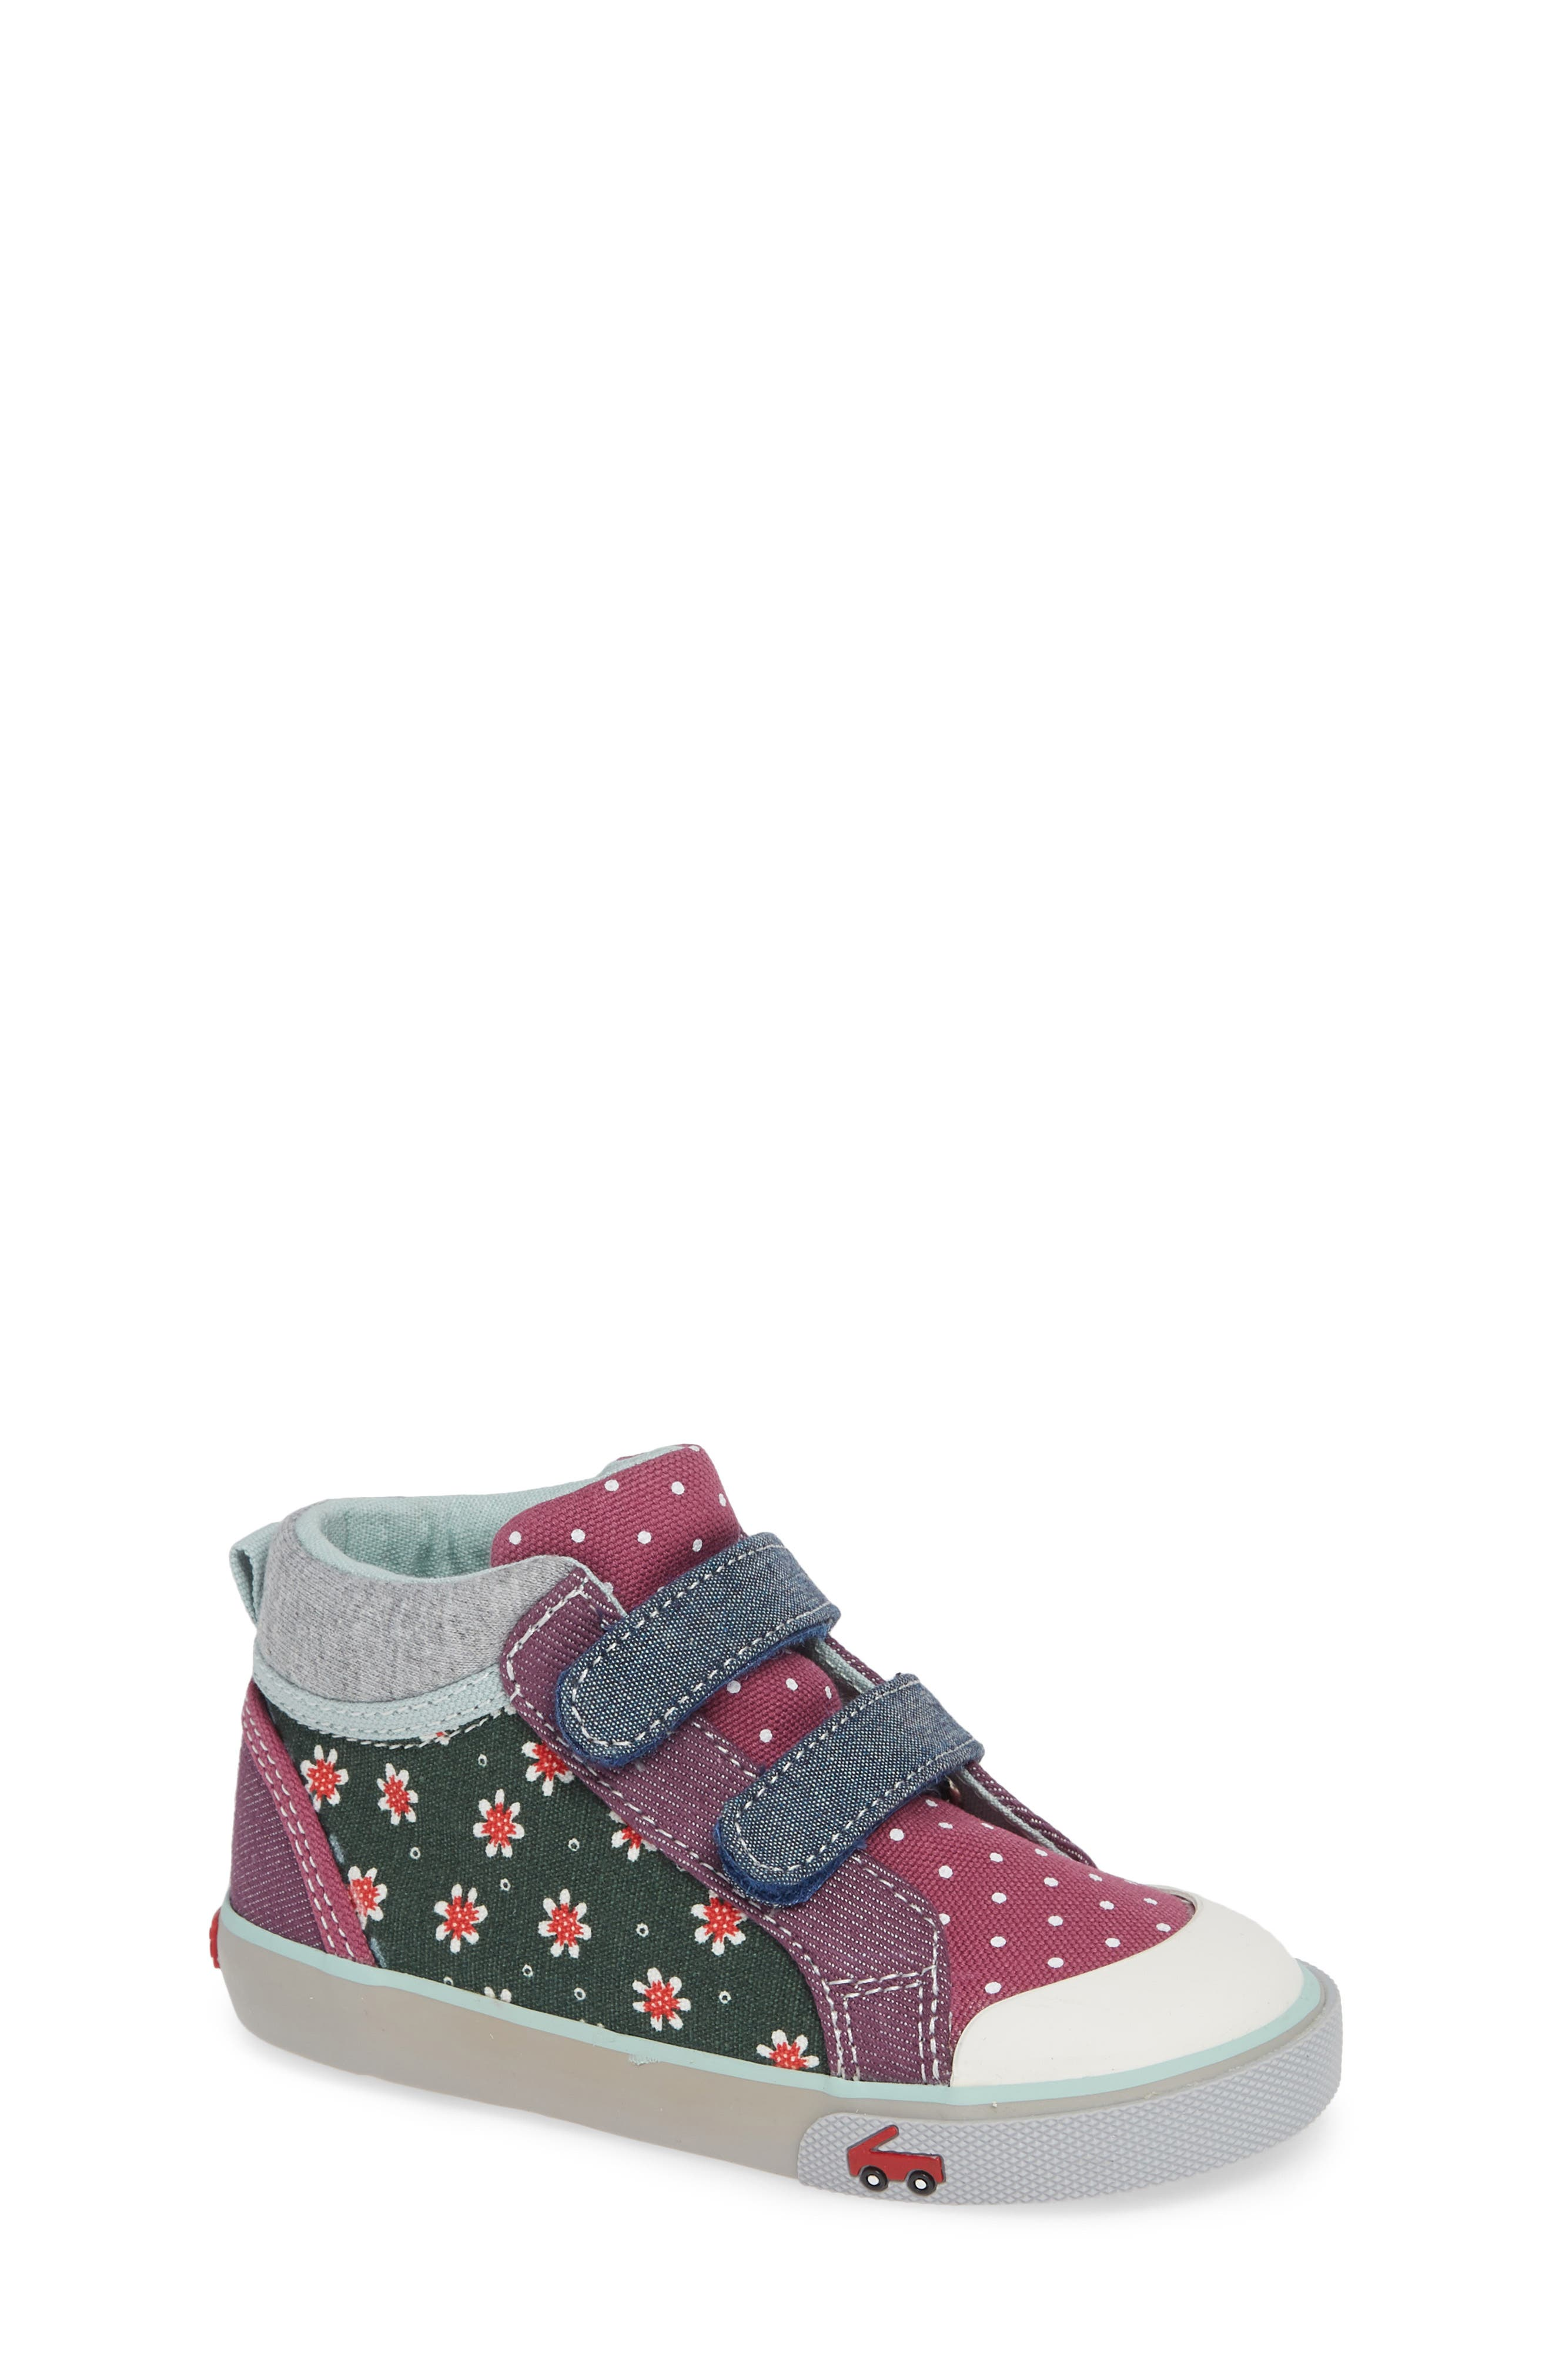 Kya Sneaker,                             Main thumbnail 1, color,                             GREEN FLORAL/MULTI